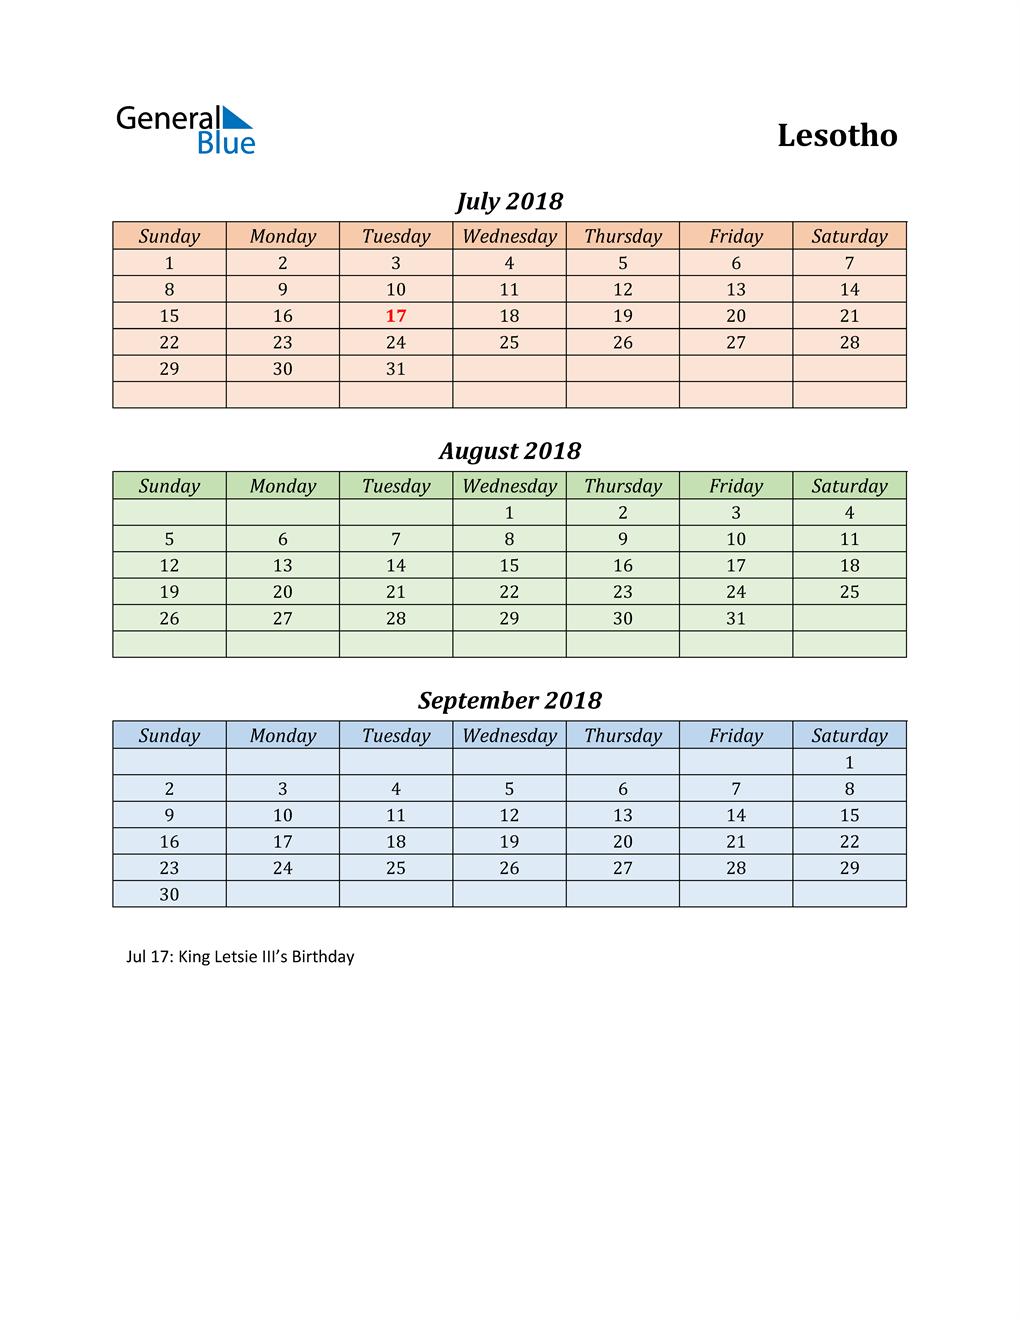 Q3 2018 Holiday Calendar - Lesotho